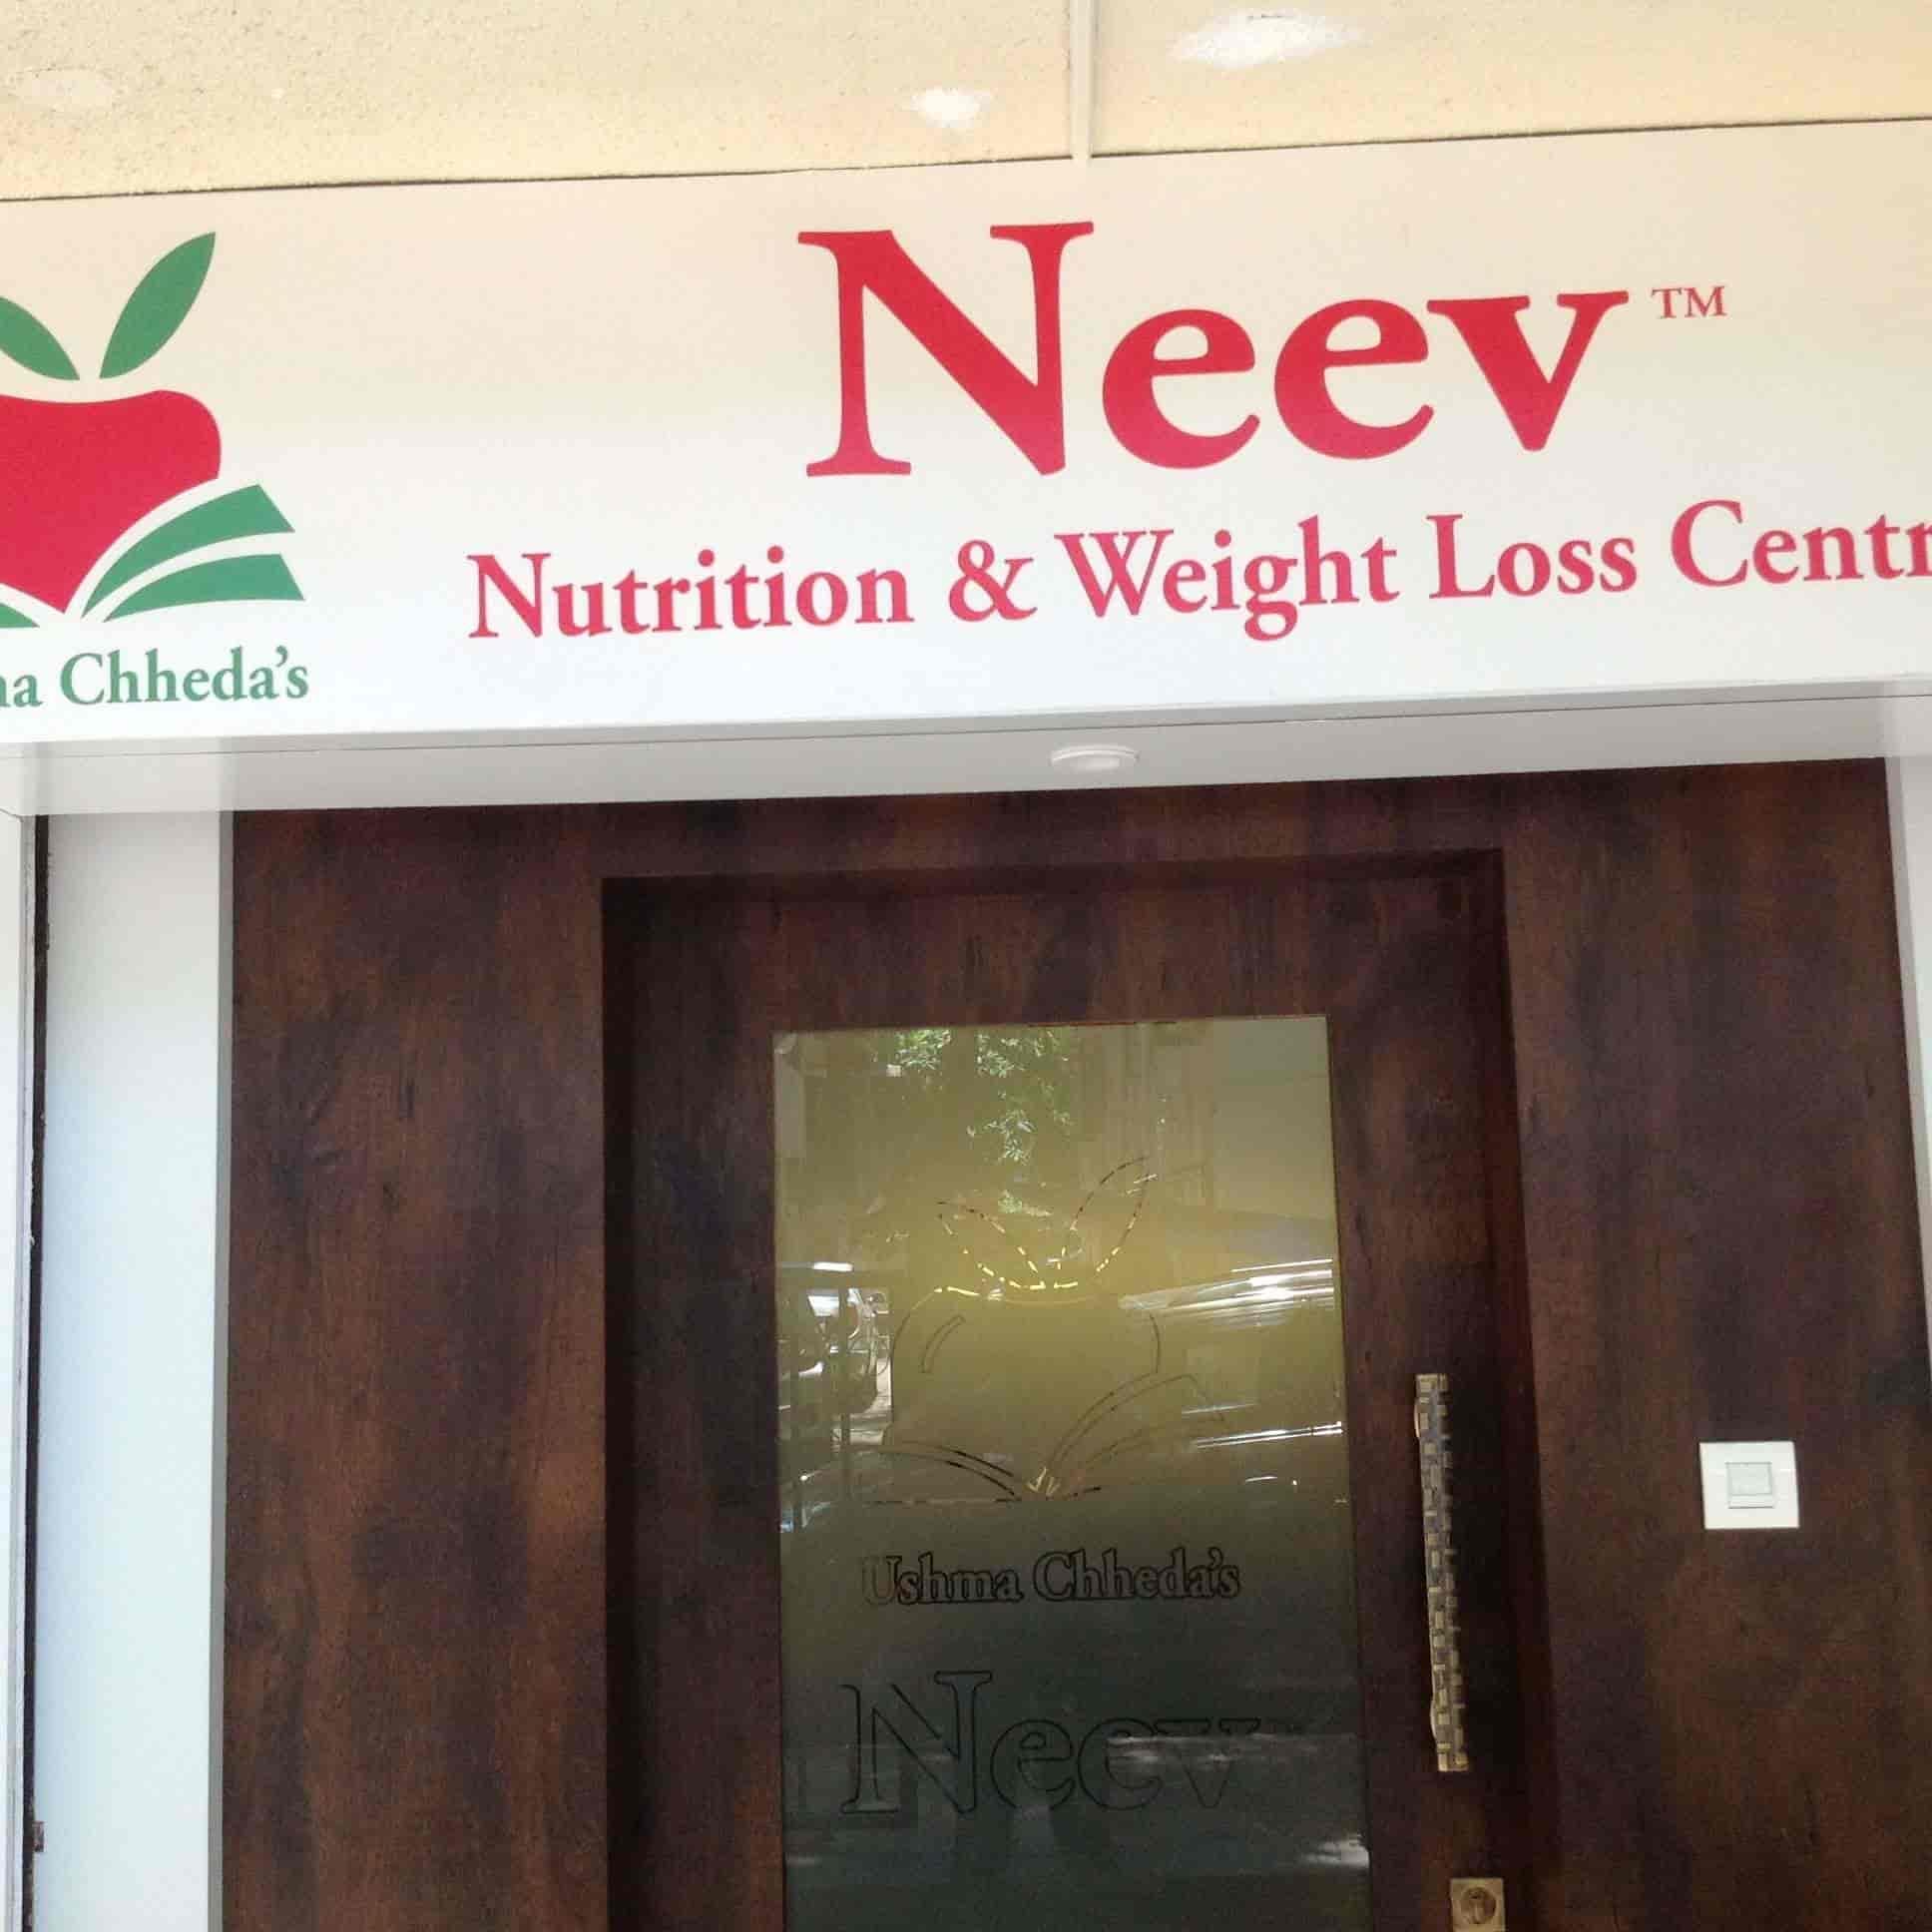 48hr rapid detox weight loss